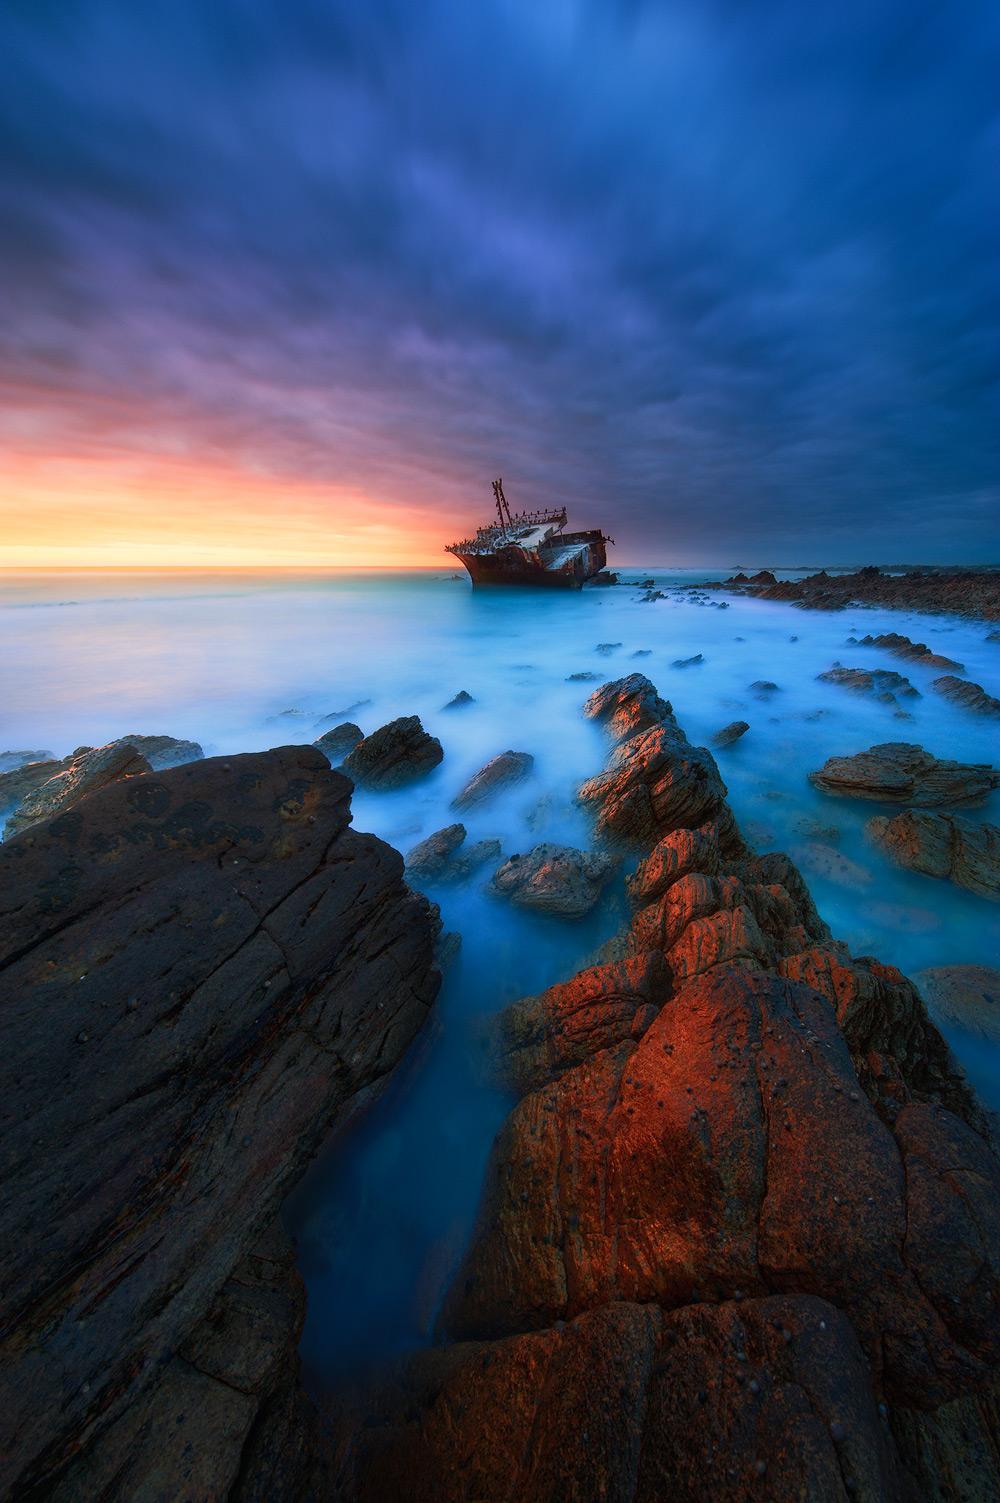 Meisho Maru Wreck